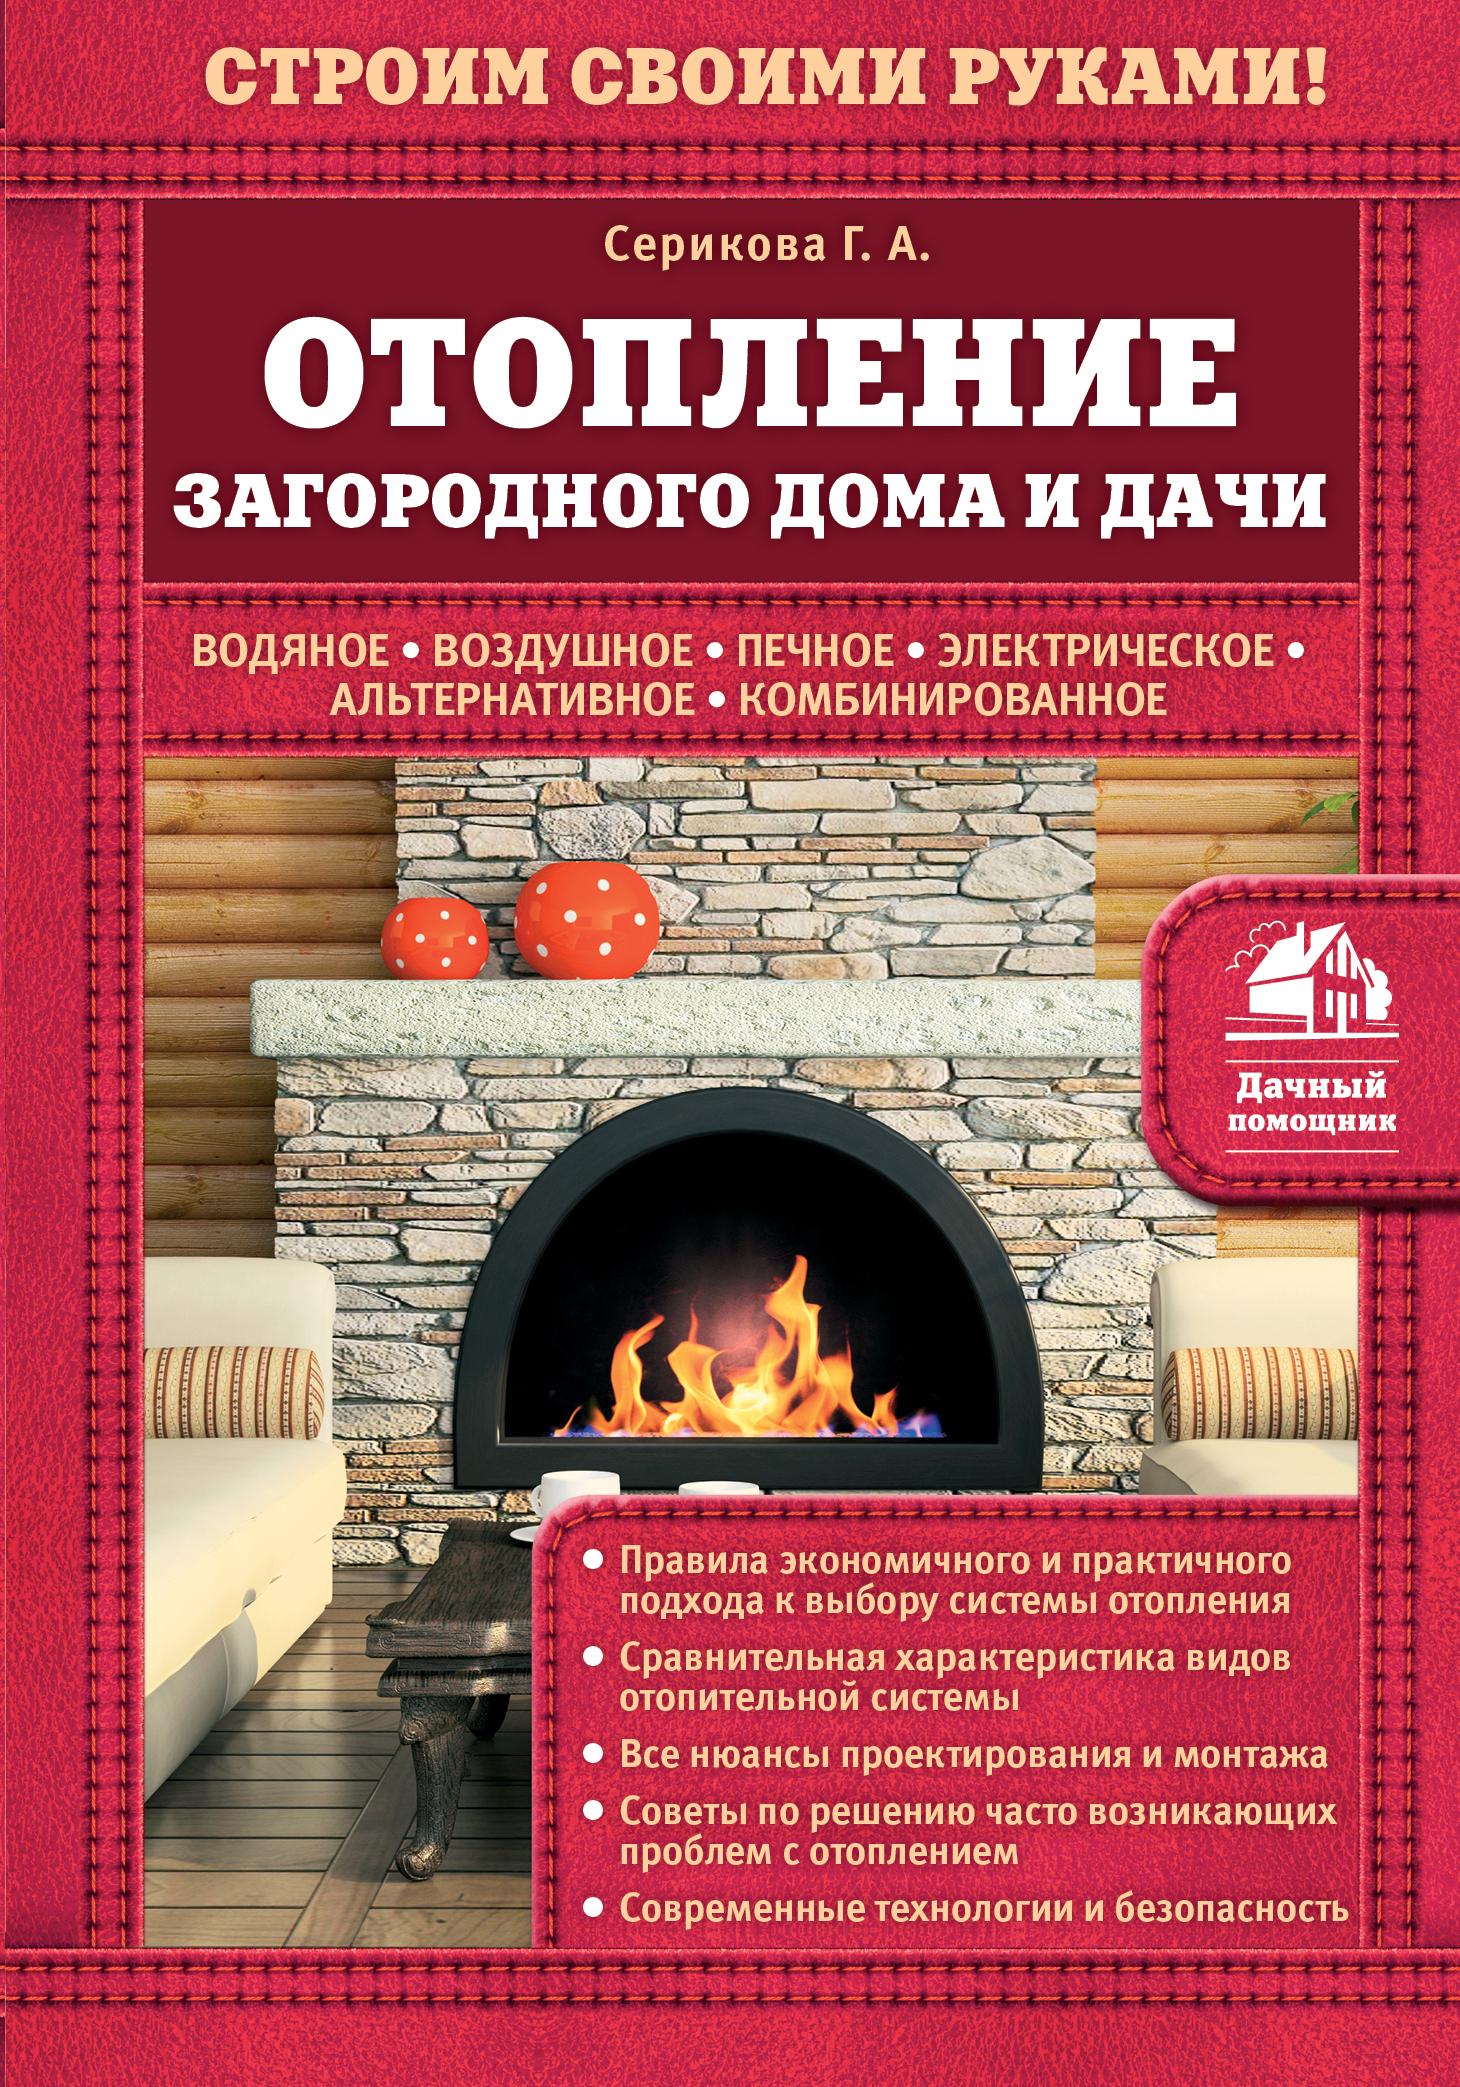 Г. А. Серикова Отопление загородного дома и дачи калинина и отопление загородного дома